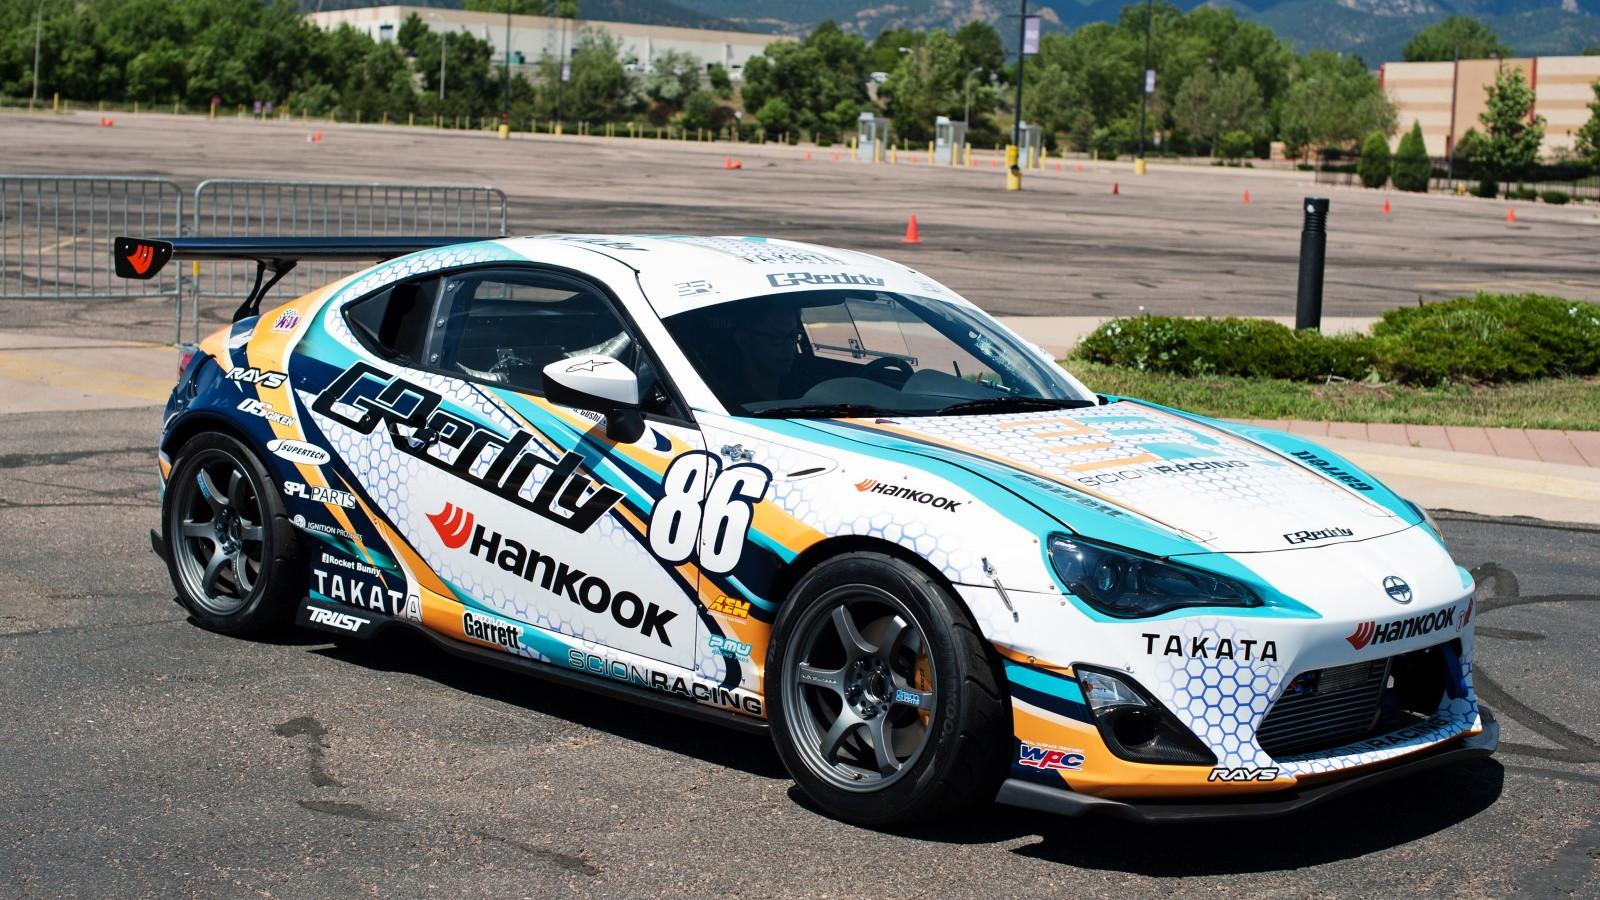 GReddy Racing Scion FR-S prepares for Pikes Peak 2014